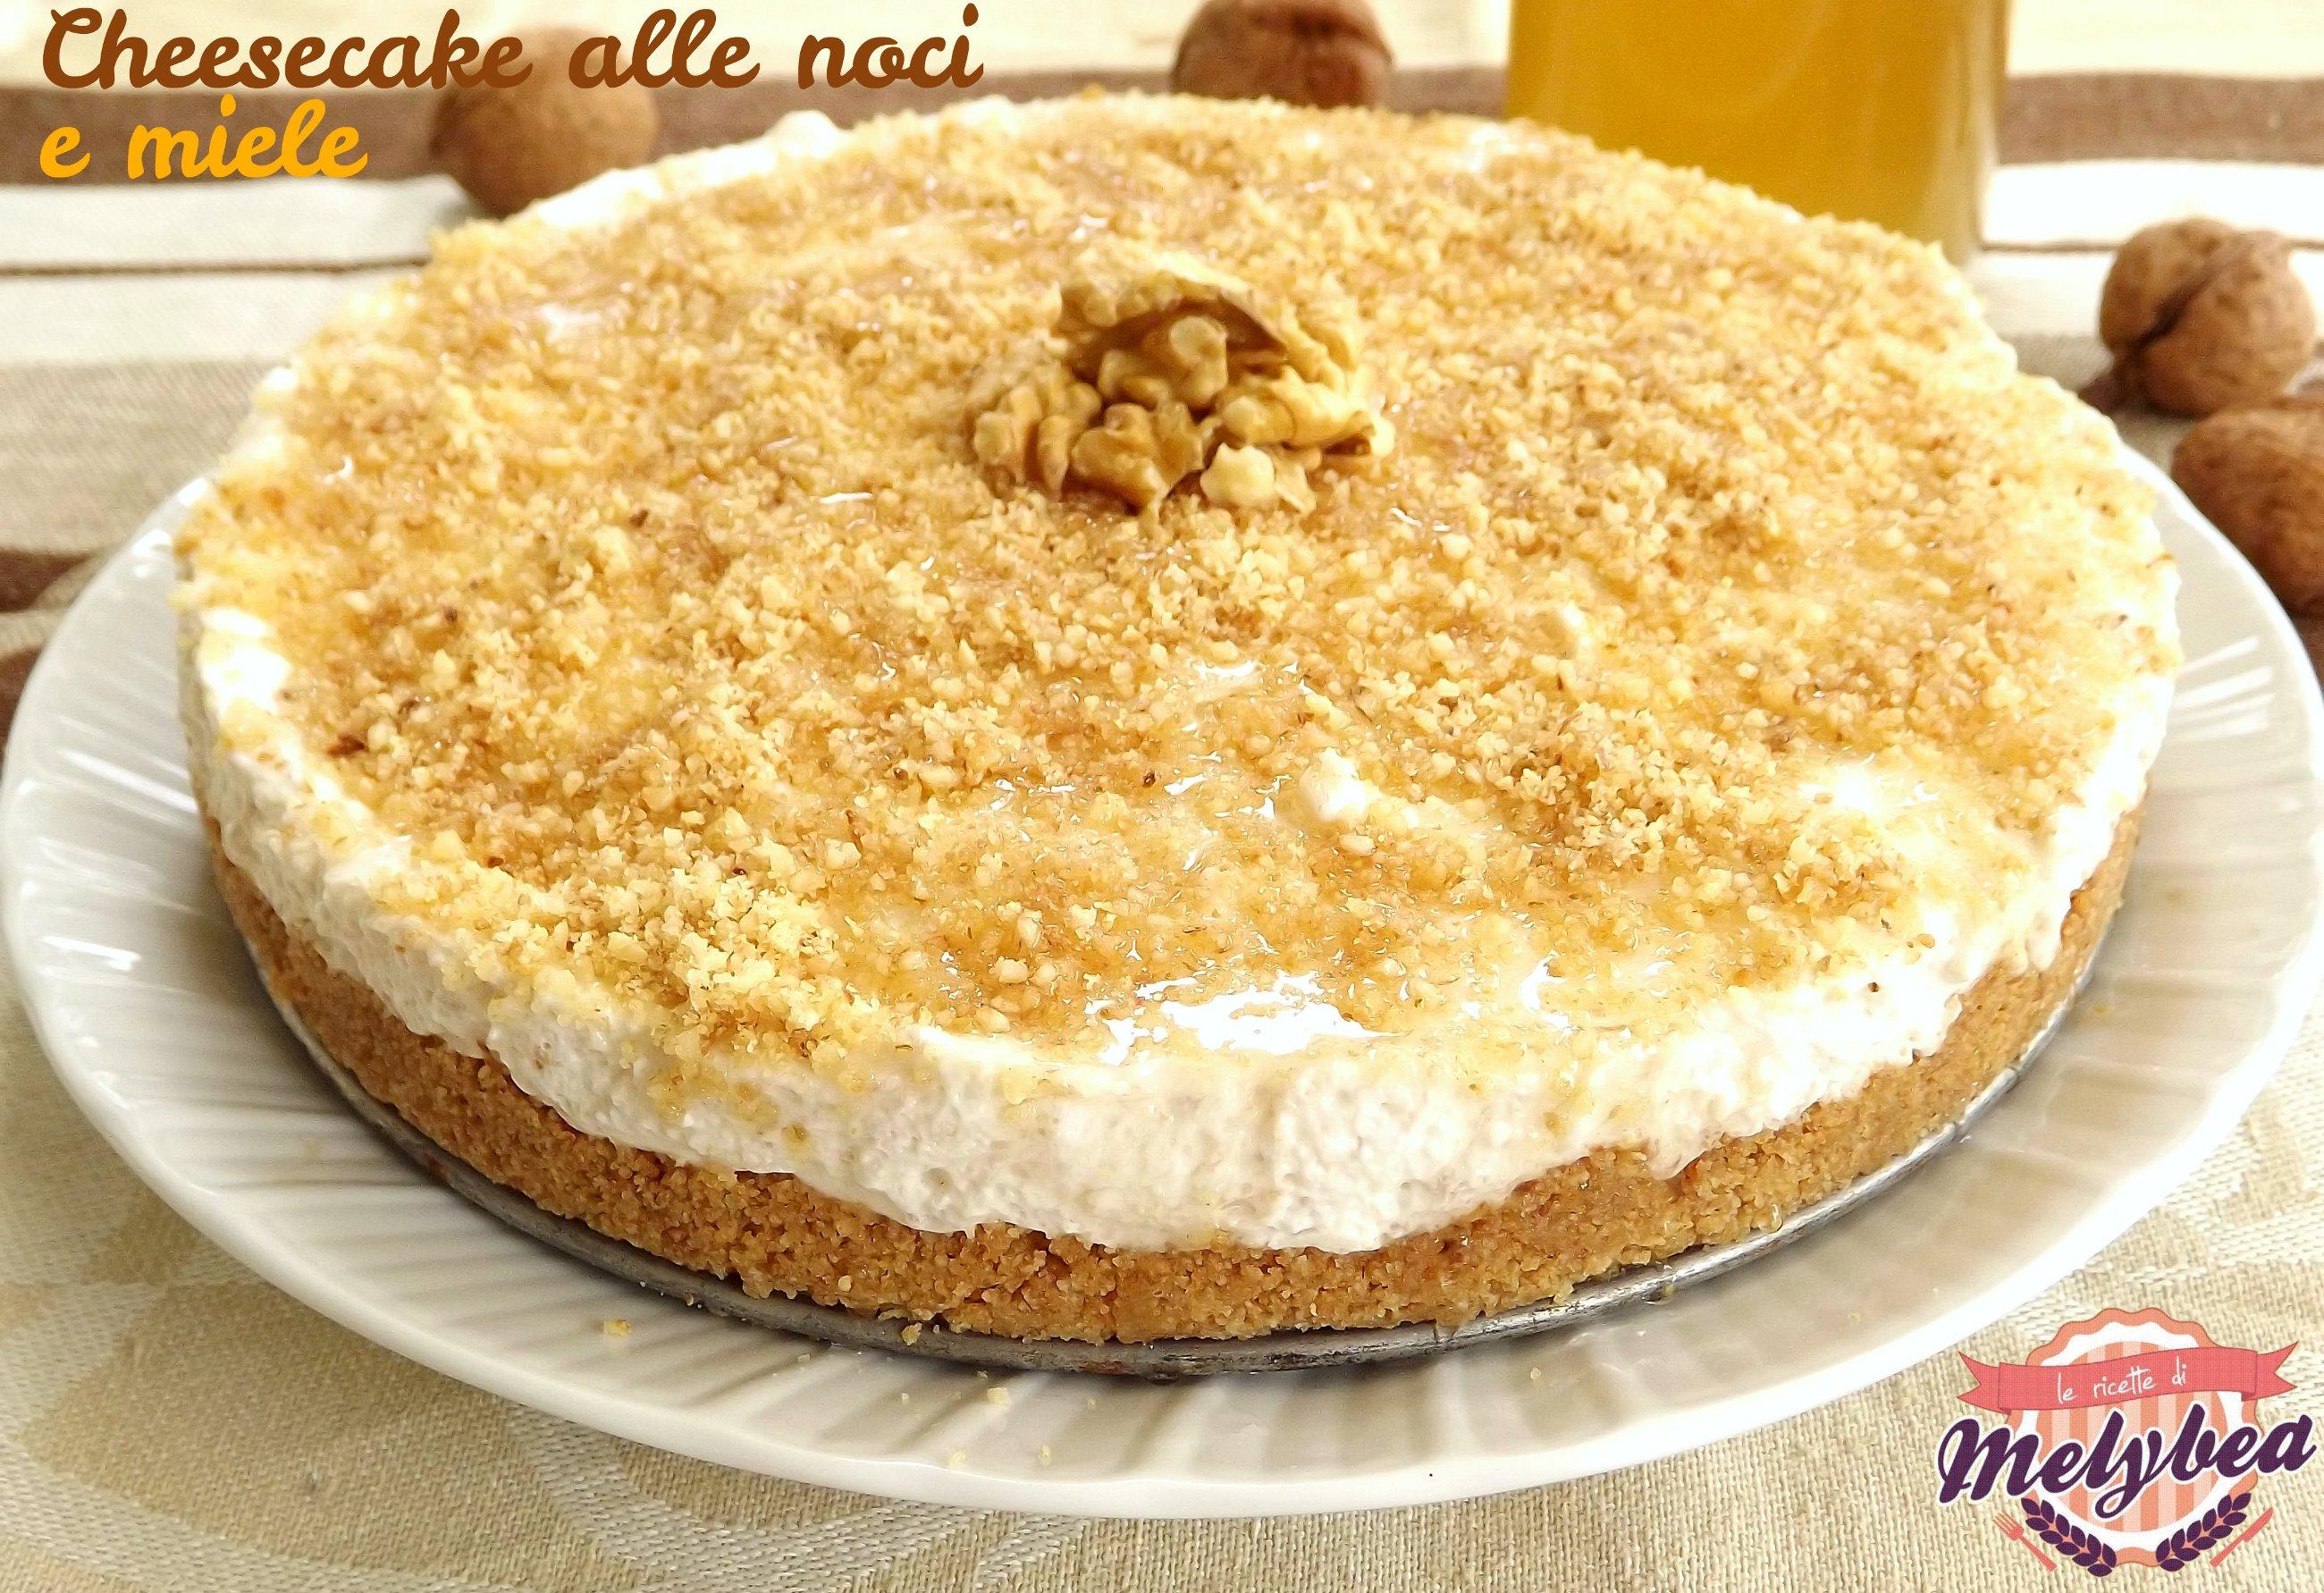 cheesecake alle noci e miele